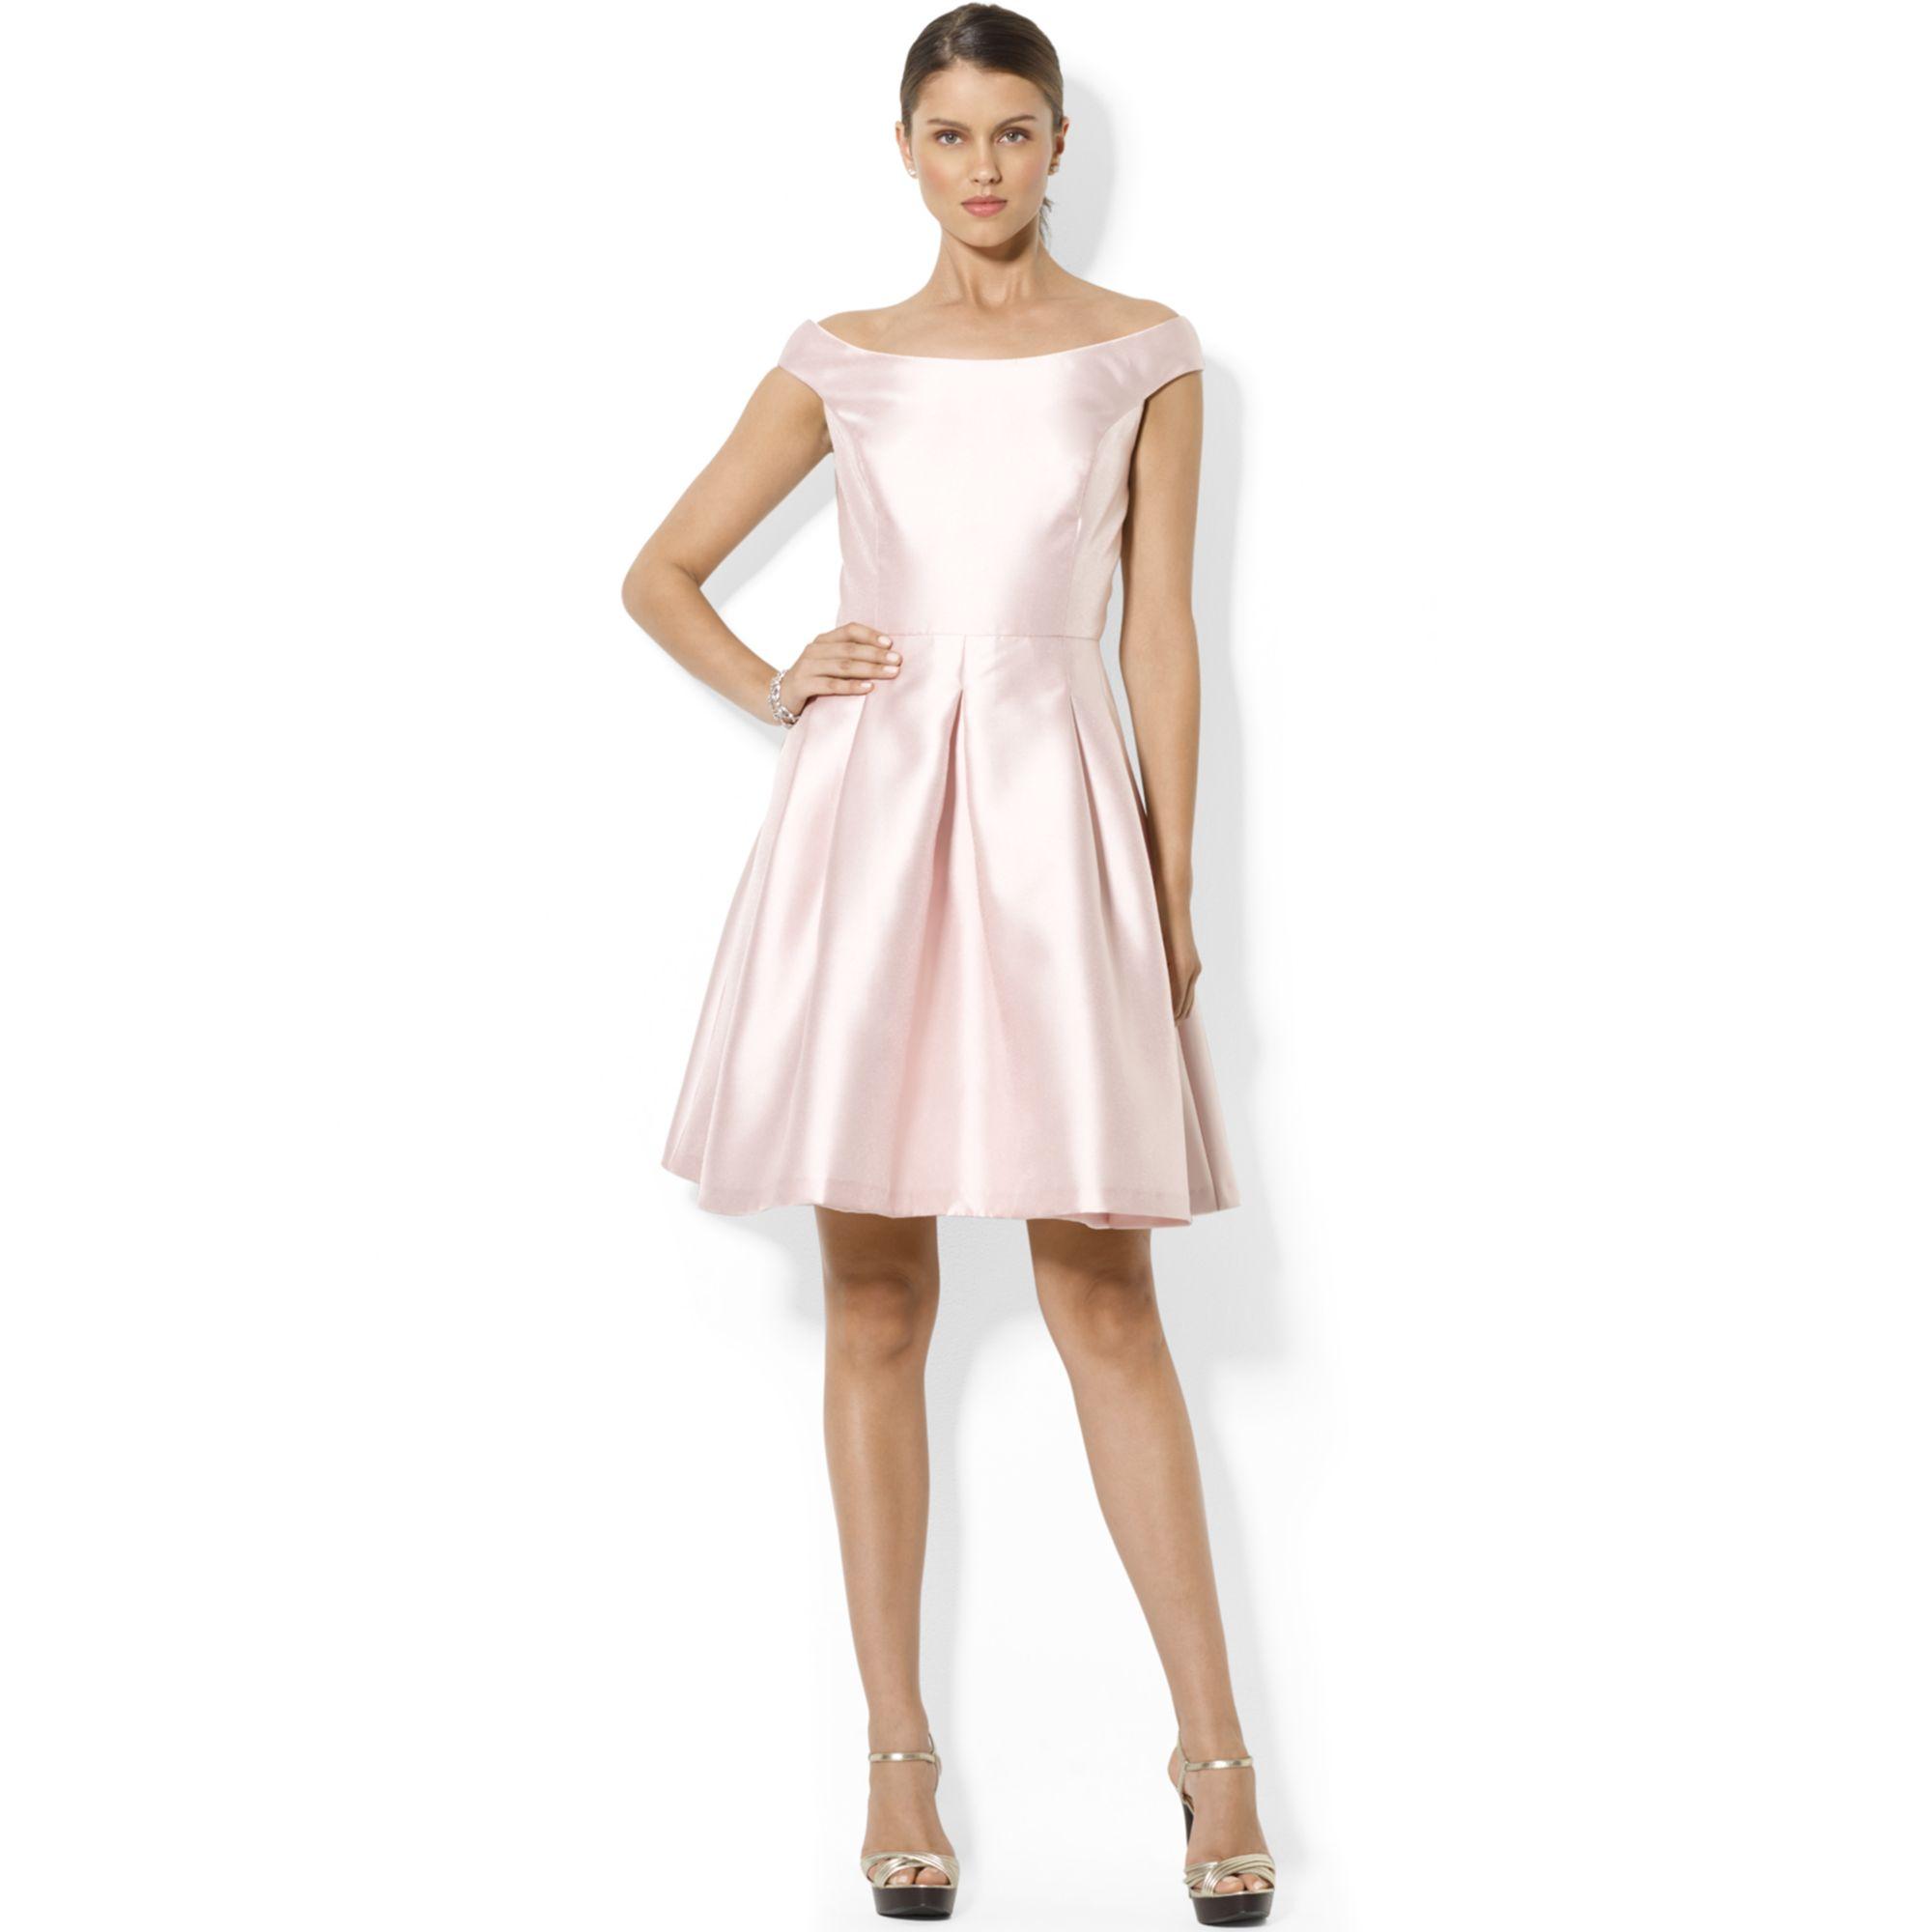 db7e18d3e34 Lauren by Ralph Lauren Capsleeve Boatneck Satin Flare Dress in Pink ...